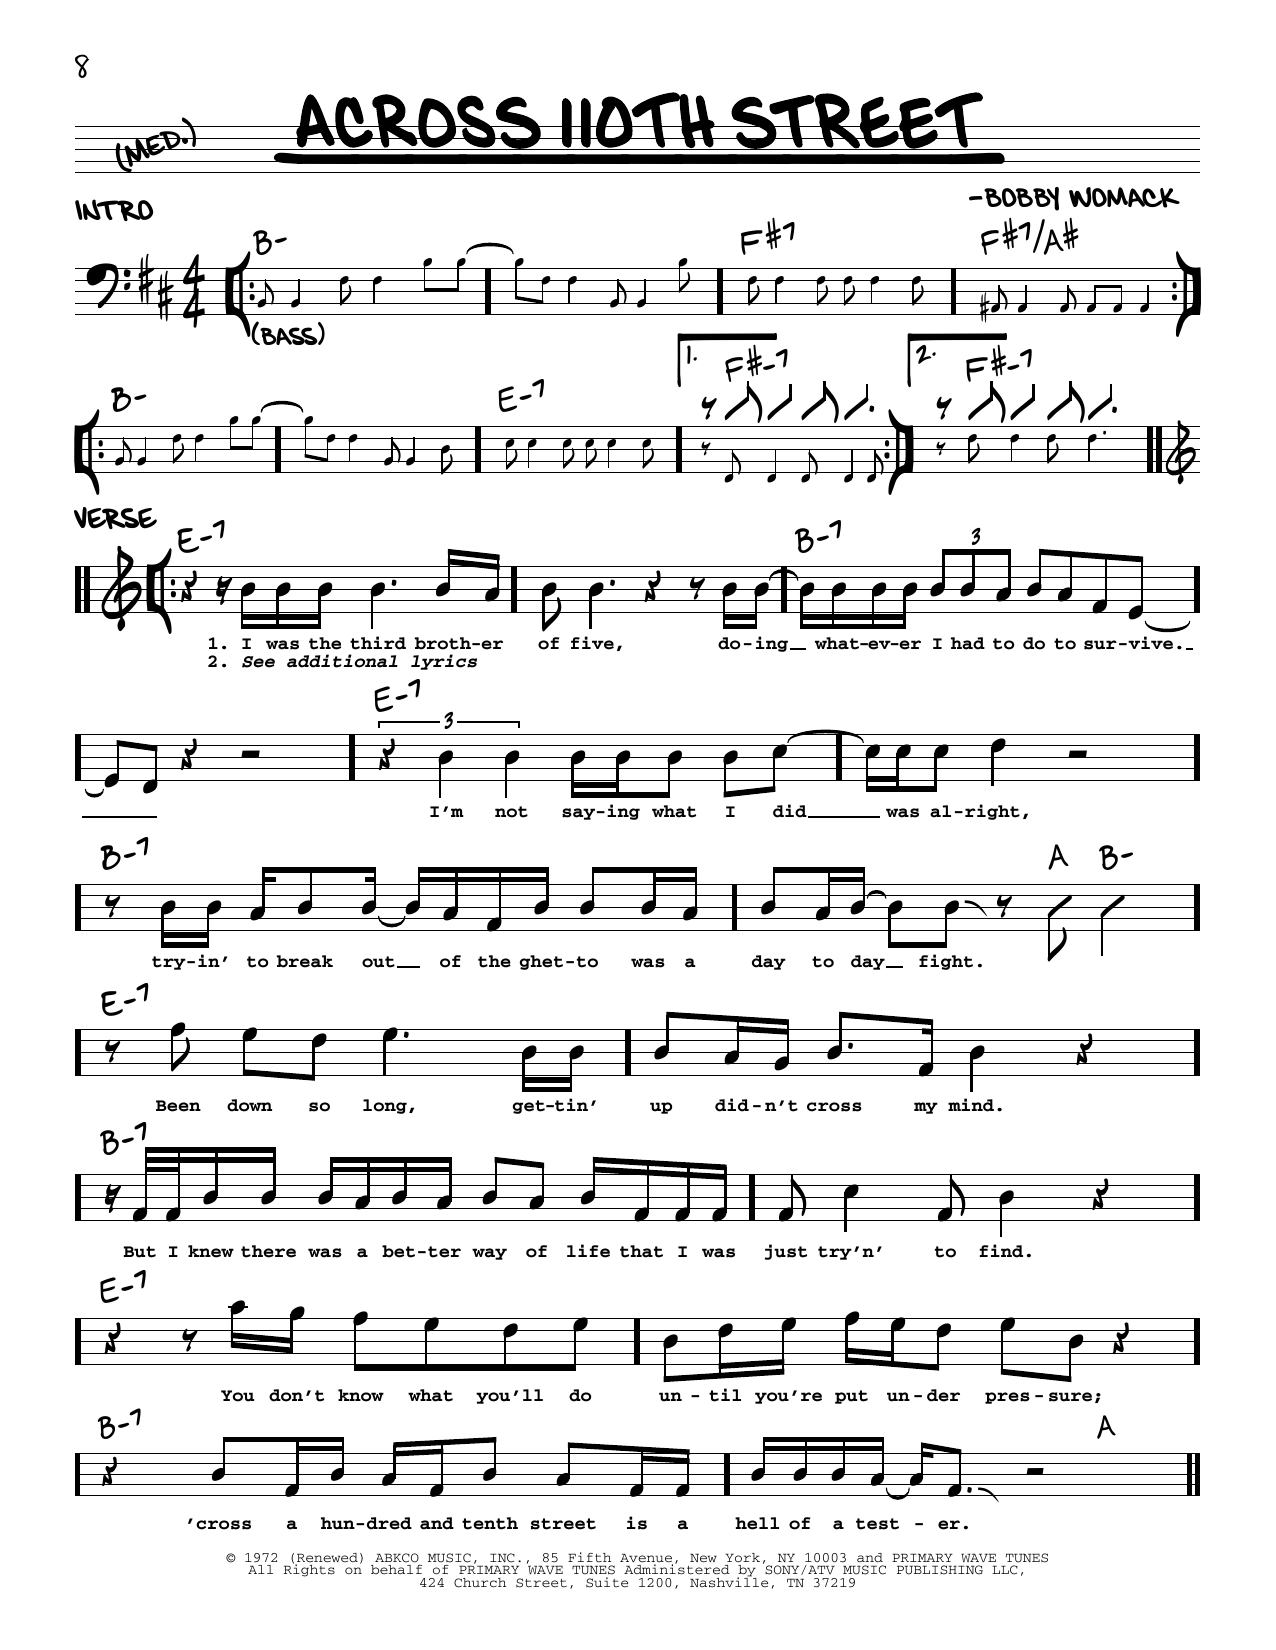 Bobby Womack Across 110th Street sheet music notes printable PDF score